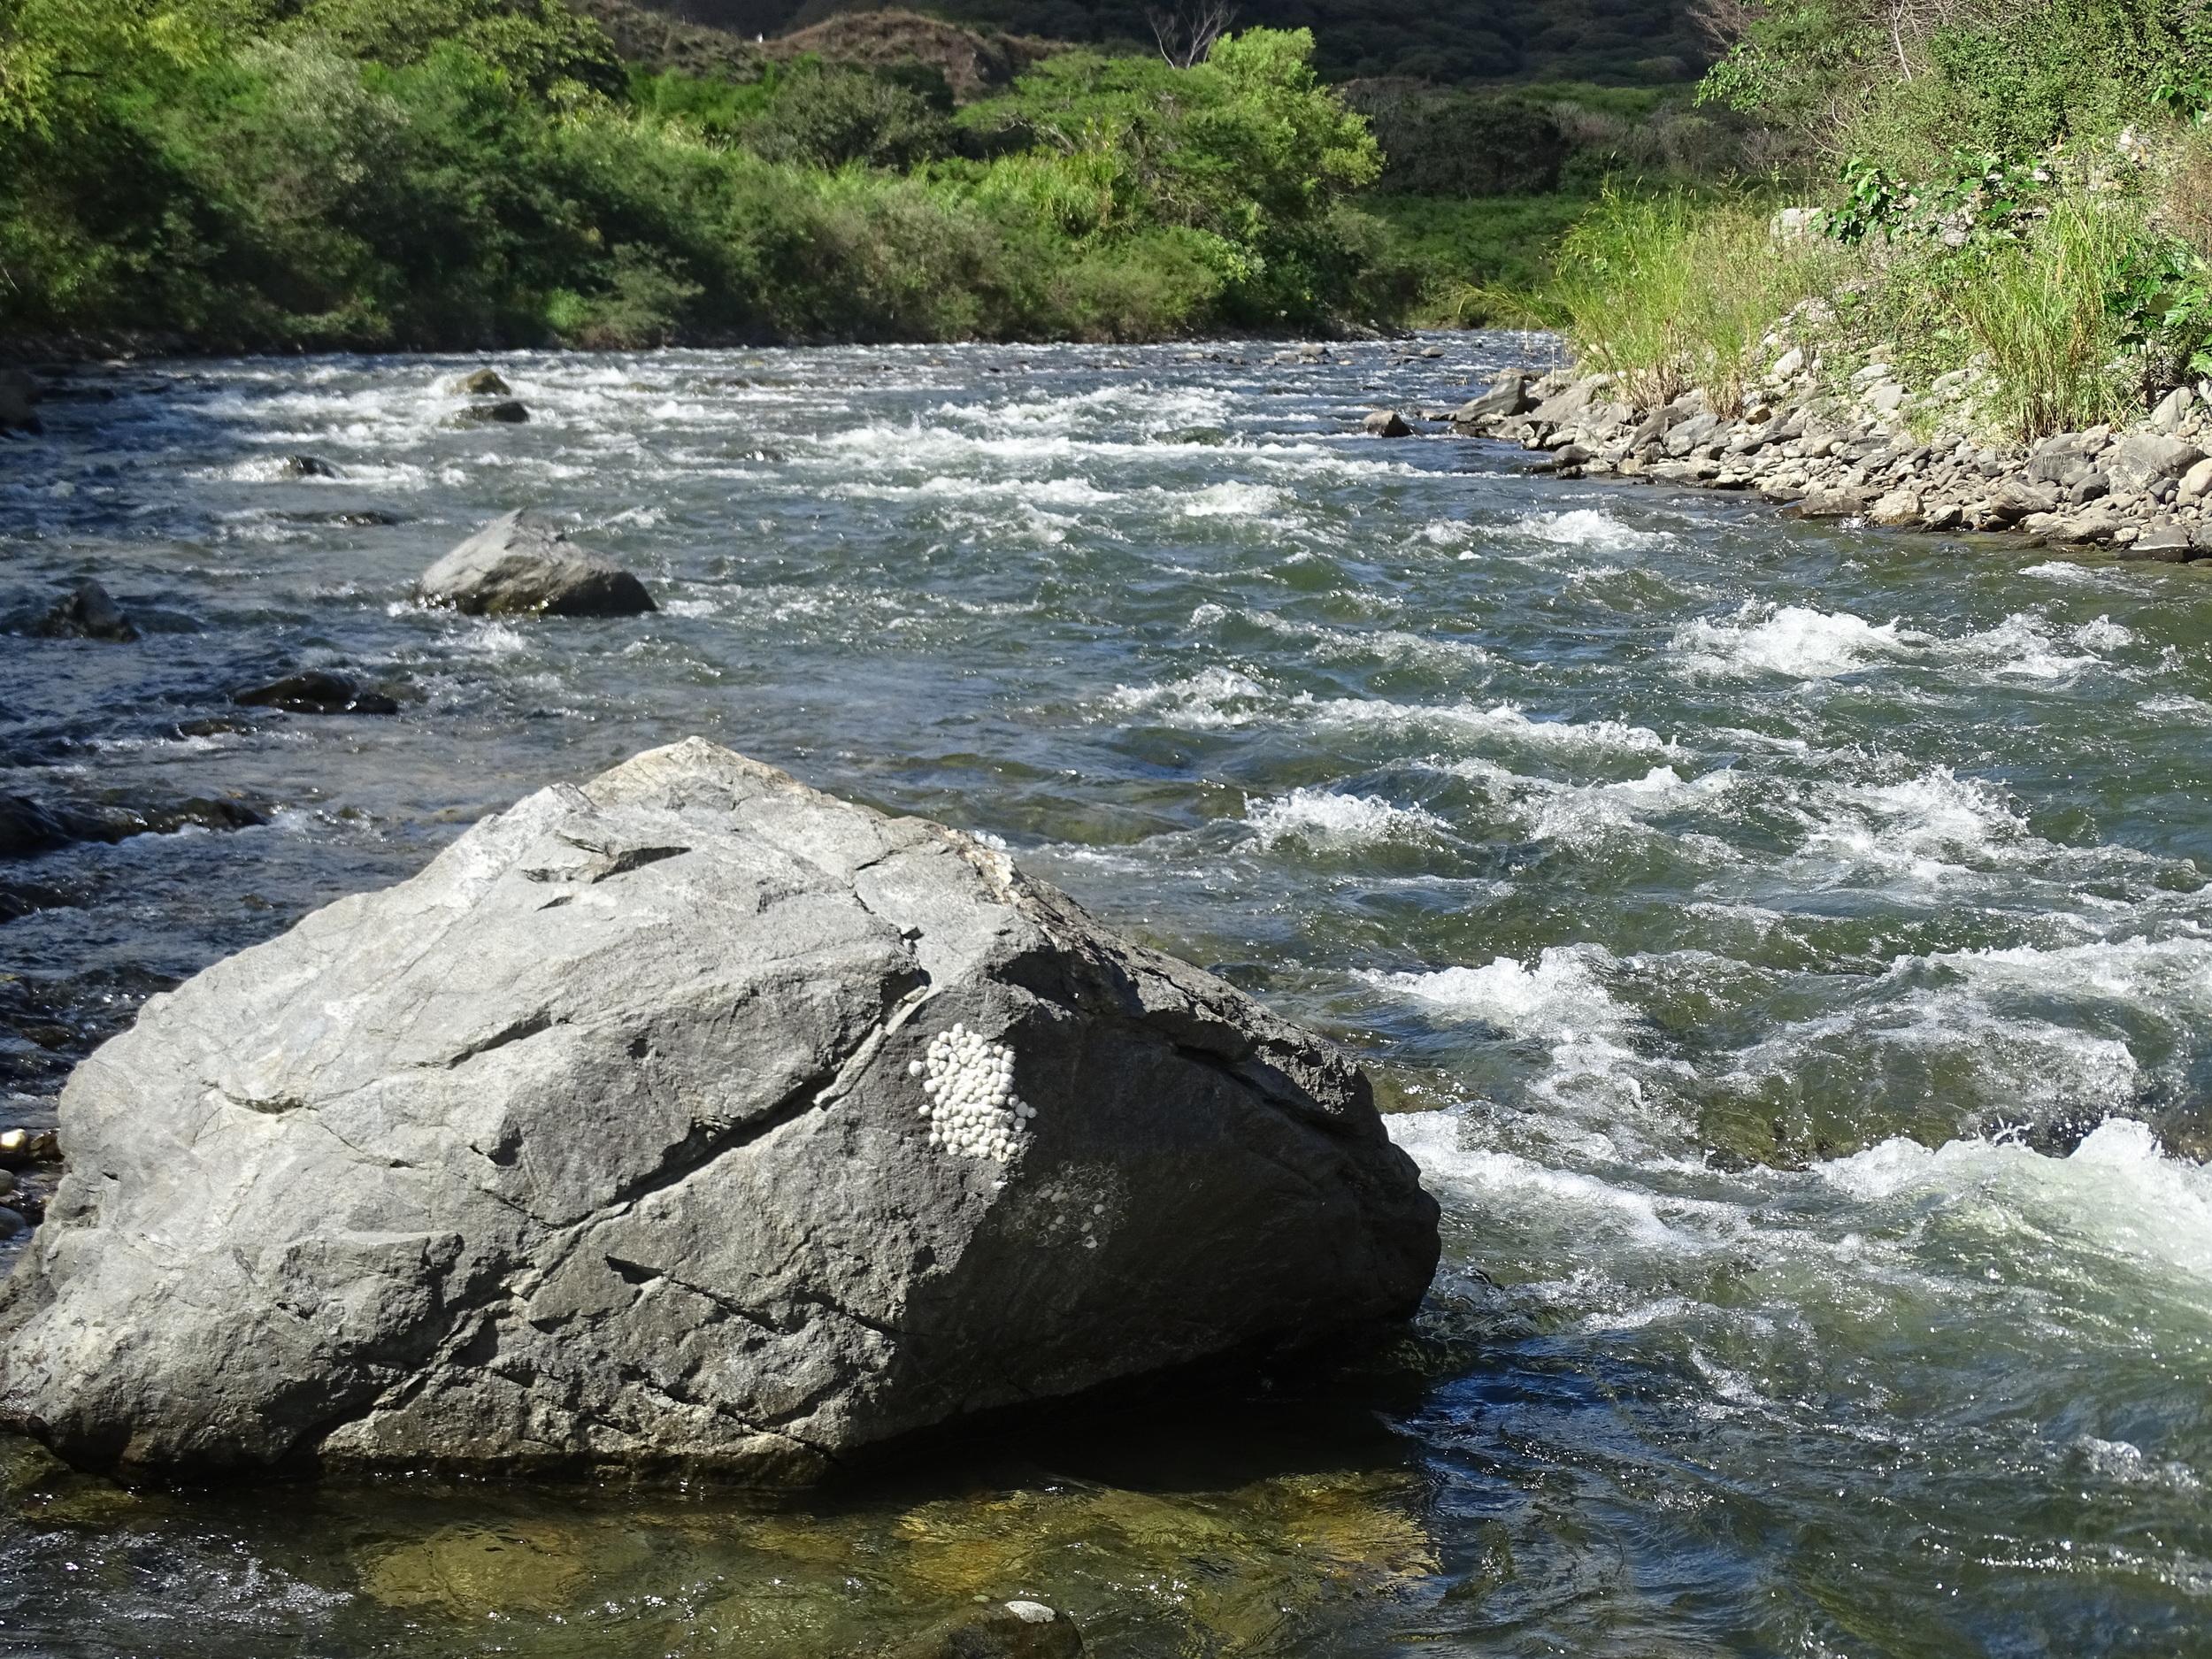 This beautiful river runs near Scott's property.